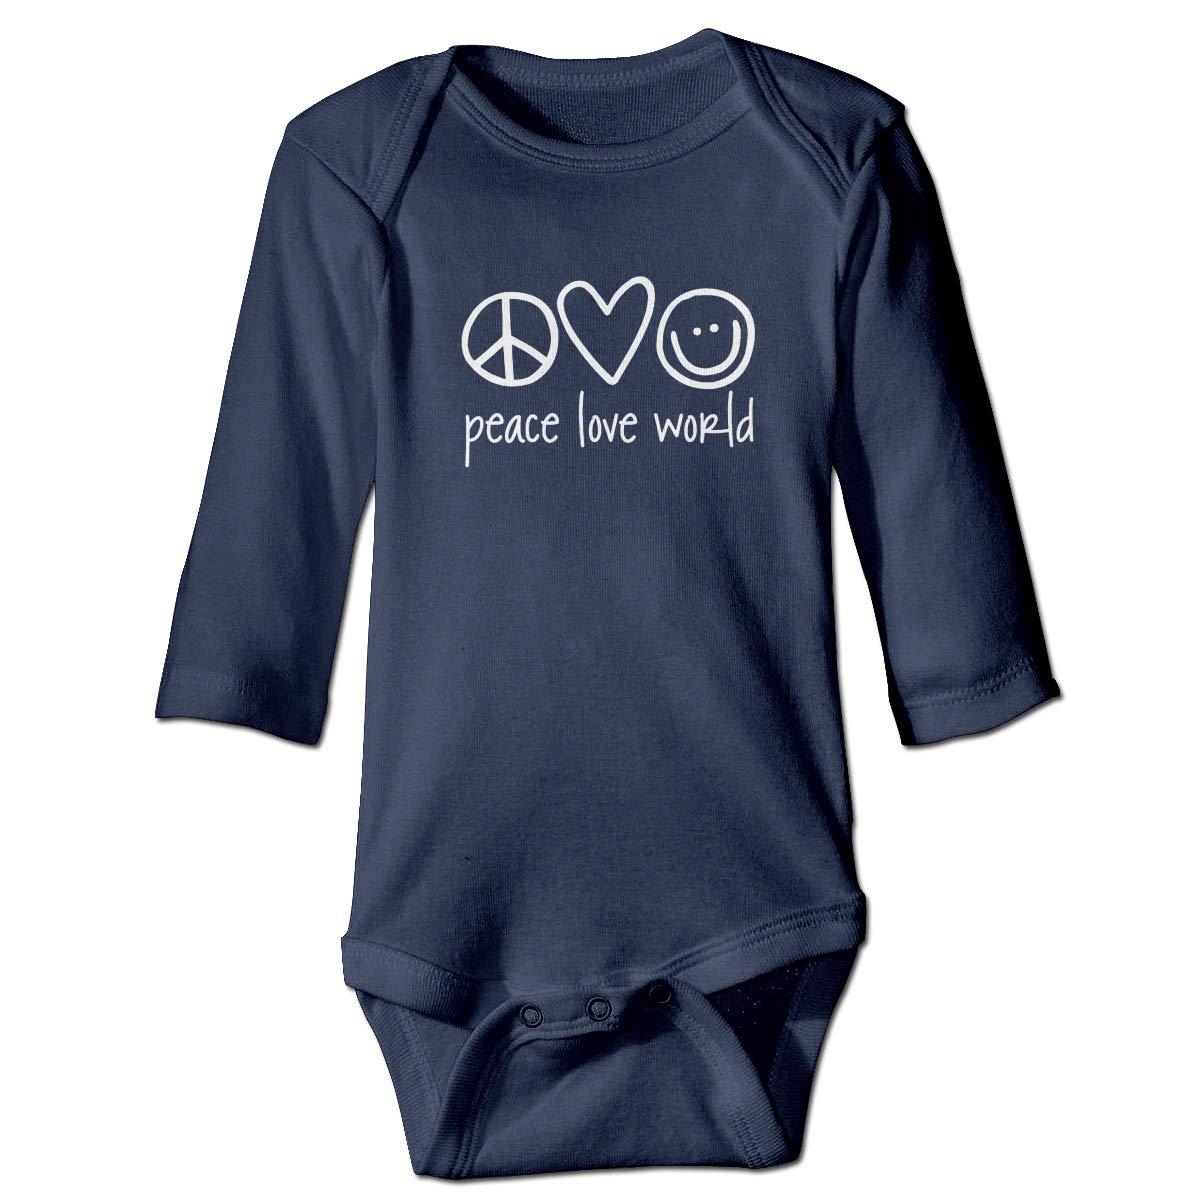 Peace Love World Baby Long Sleeve Onesies Bodysuit Cotton Romper Creeper